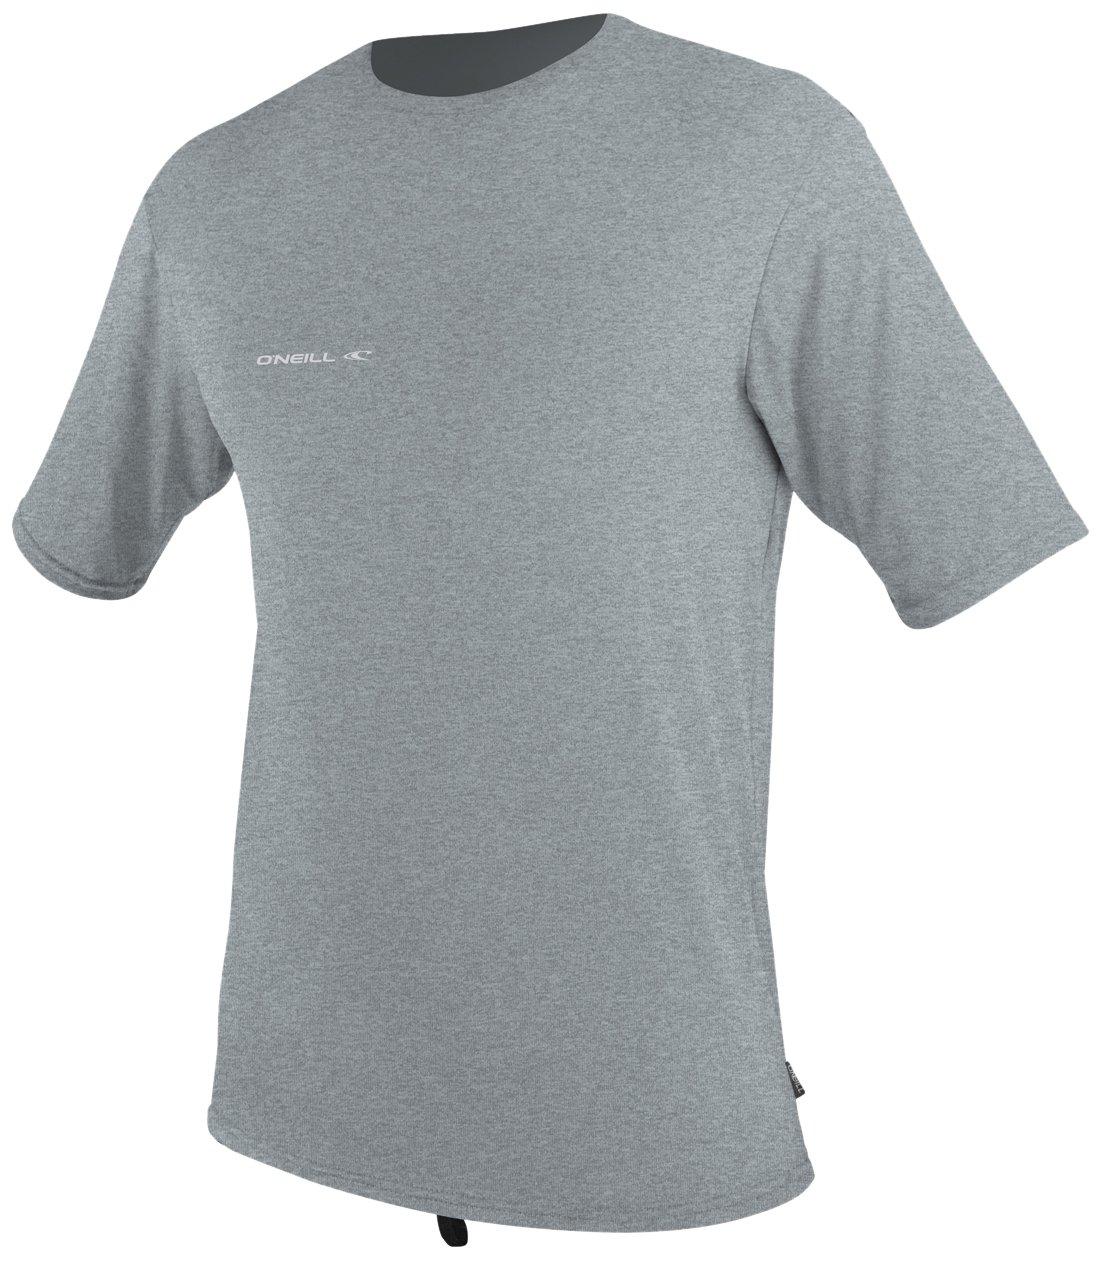 O'Neill Wetsuits  Men's Hybrid UPF 50+ Short Sleeve Sun Shirt,CoolGrey,Medium